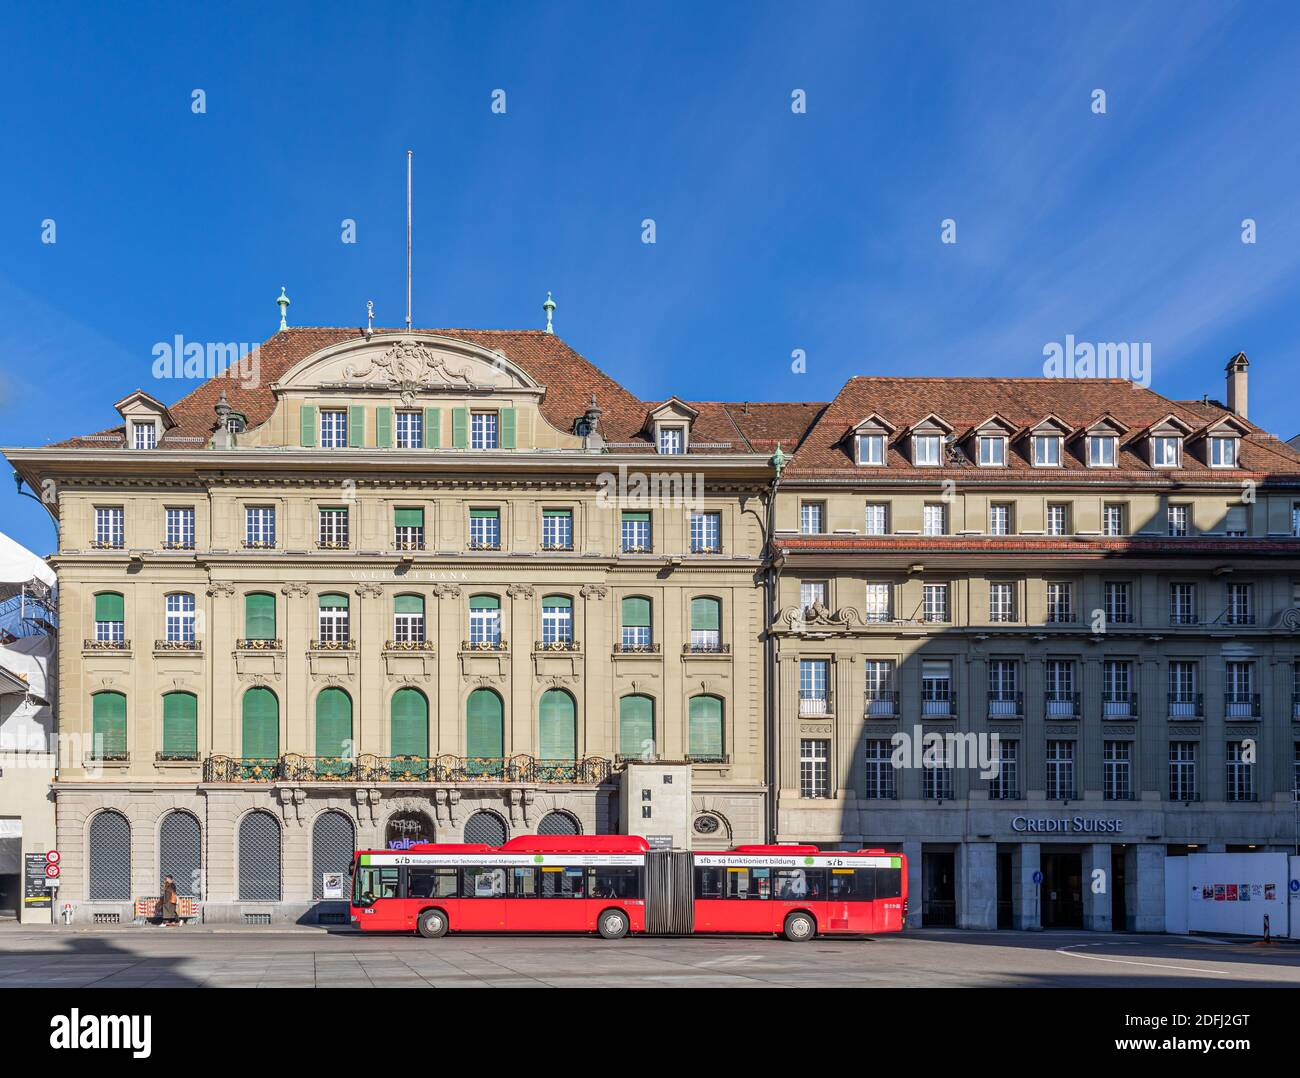 Valiant Bank and Credit Suisse Bank, Bern, Switzerland Stock Photo ...